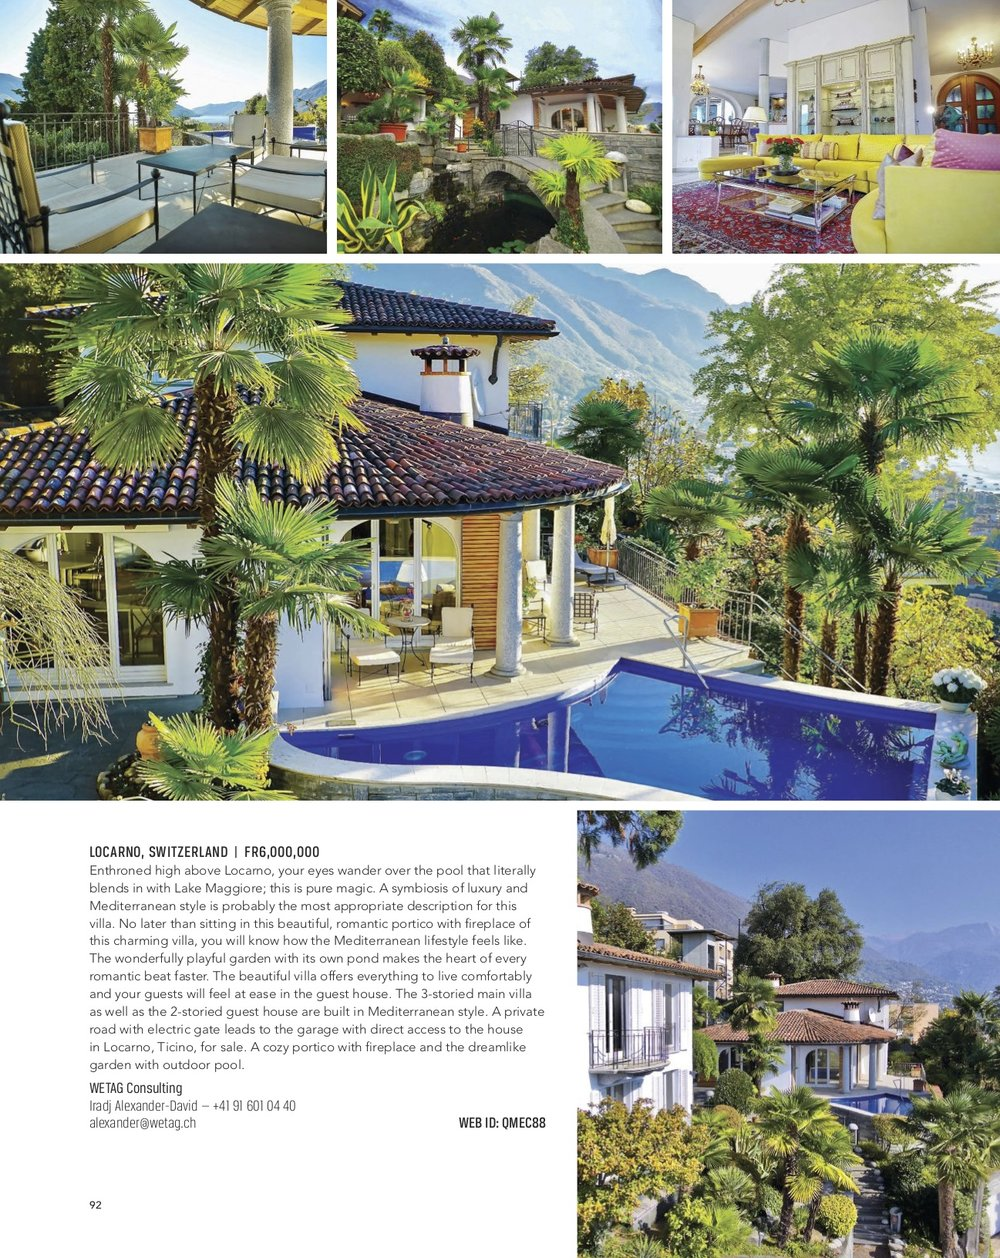 Luxury villa for sale in Carona, Switzerland, listed at Luxury Portfolio Magazine spring 2018 edition